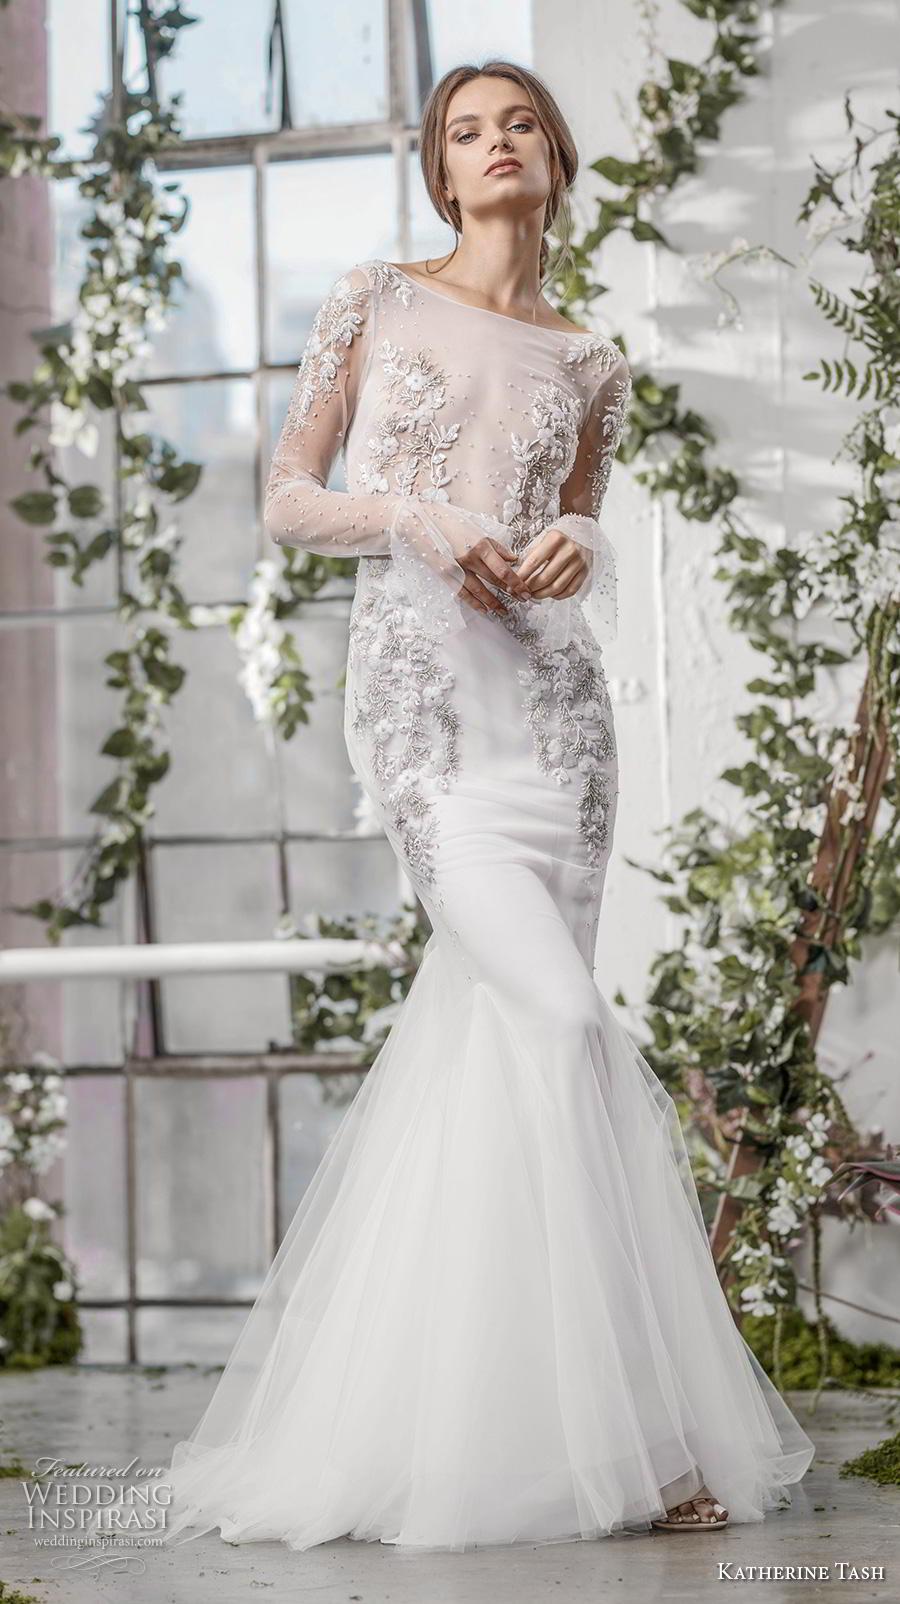 katherine tash fall 2019 bridal long poet sleeves bateau neckline heavily embellished sheer bodice elegant mermaid wedding dress backless v back medium train (5) mv